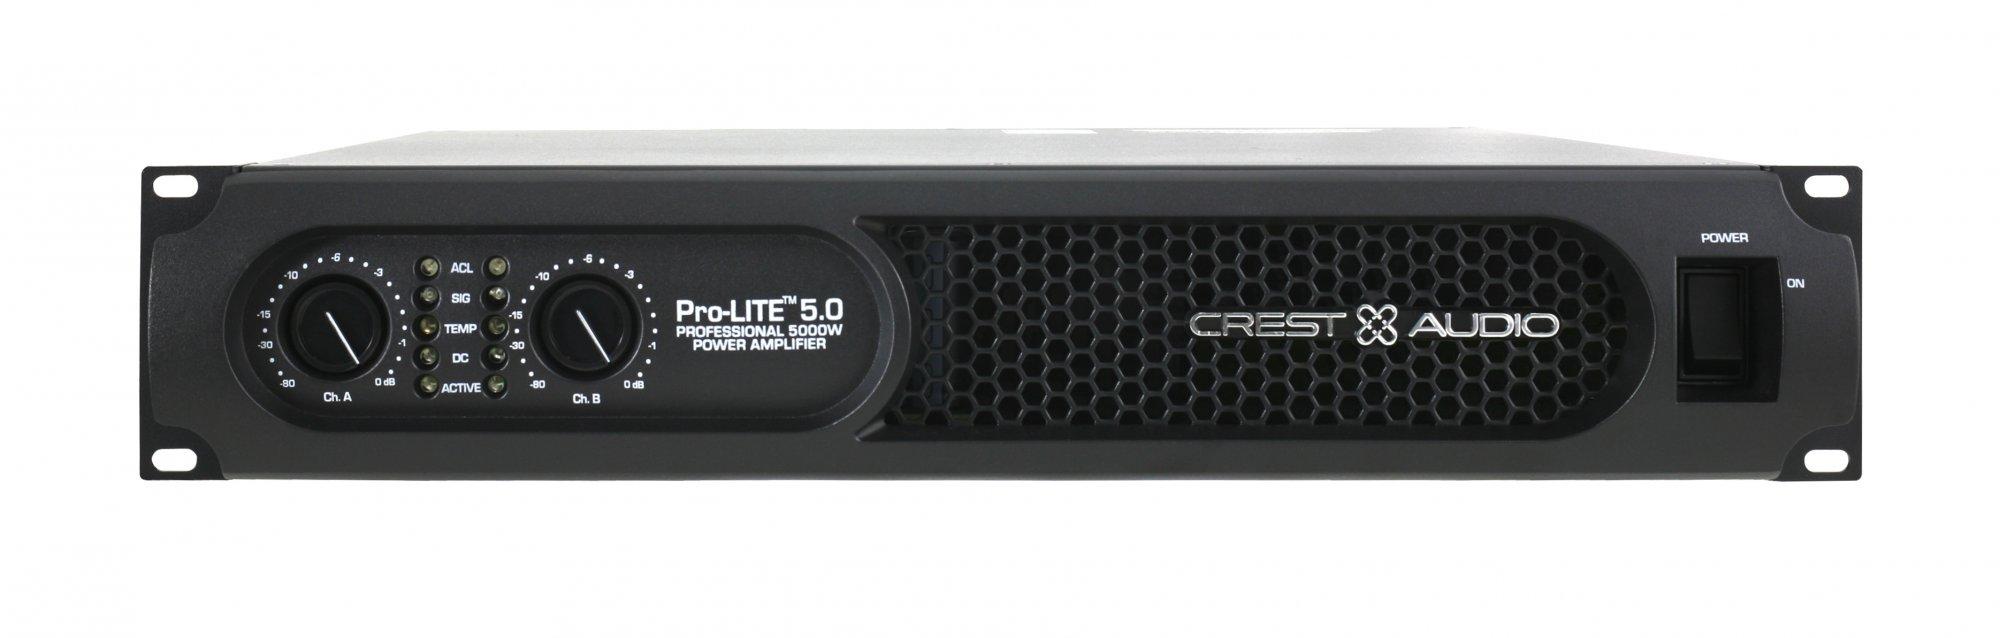 Pro-LITE 5.0